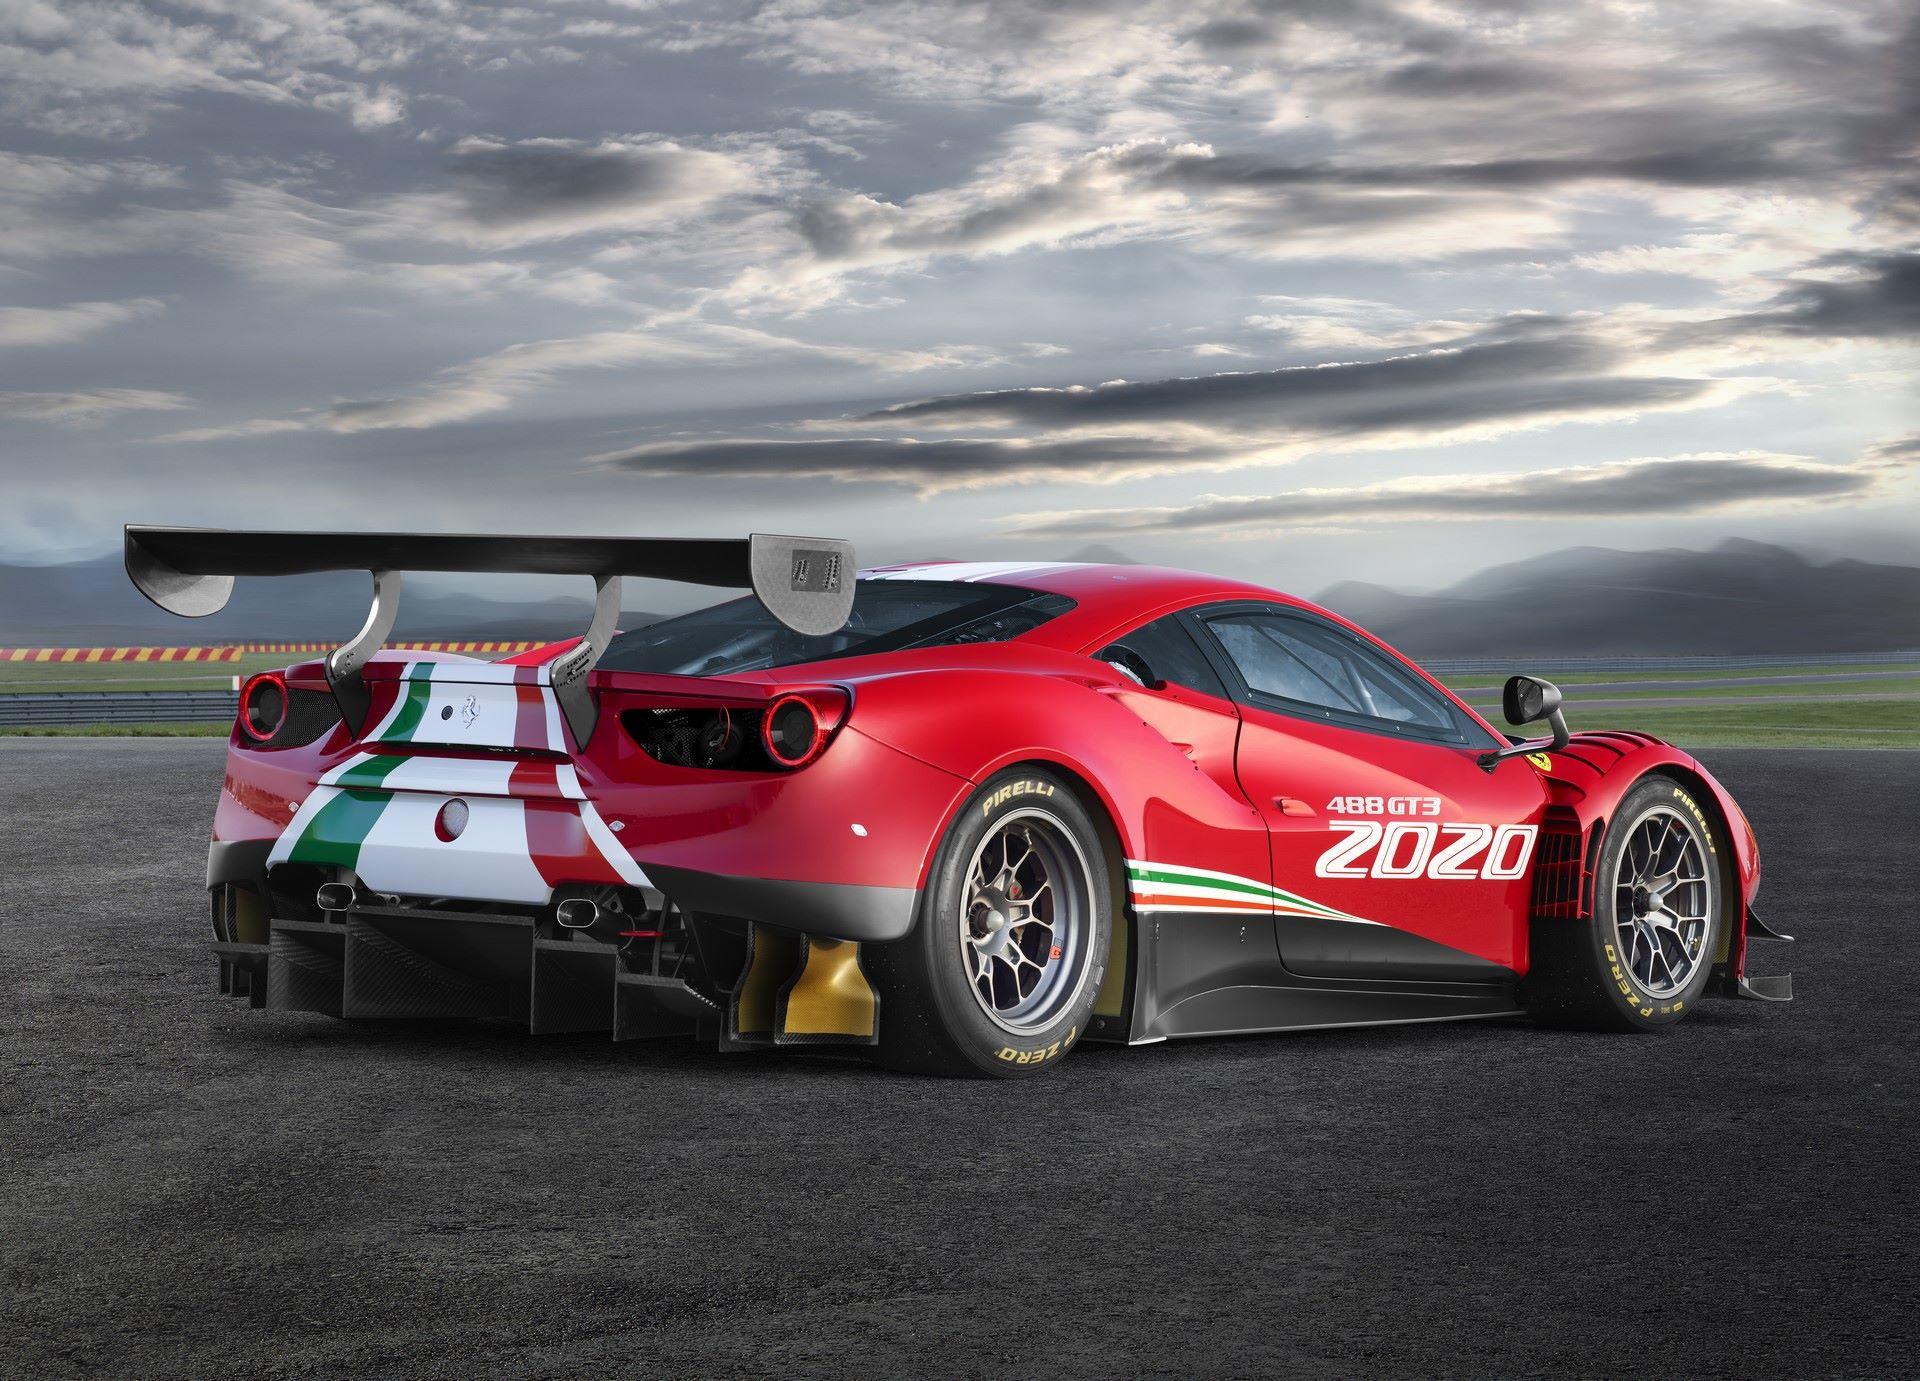 Ferrari-488-GT3-Evο-2020-2